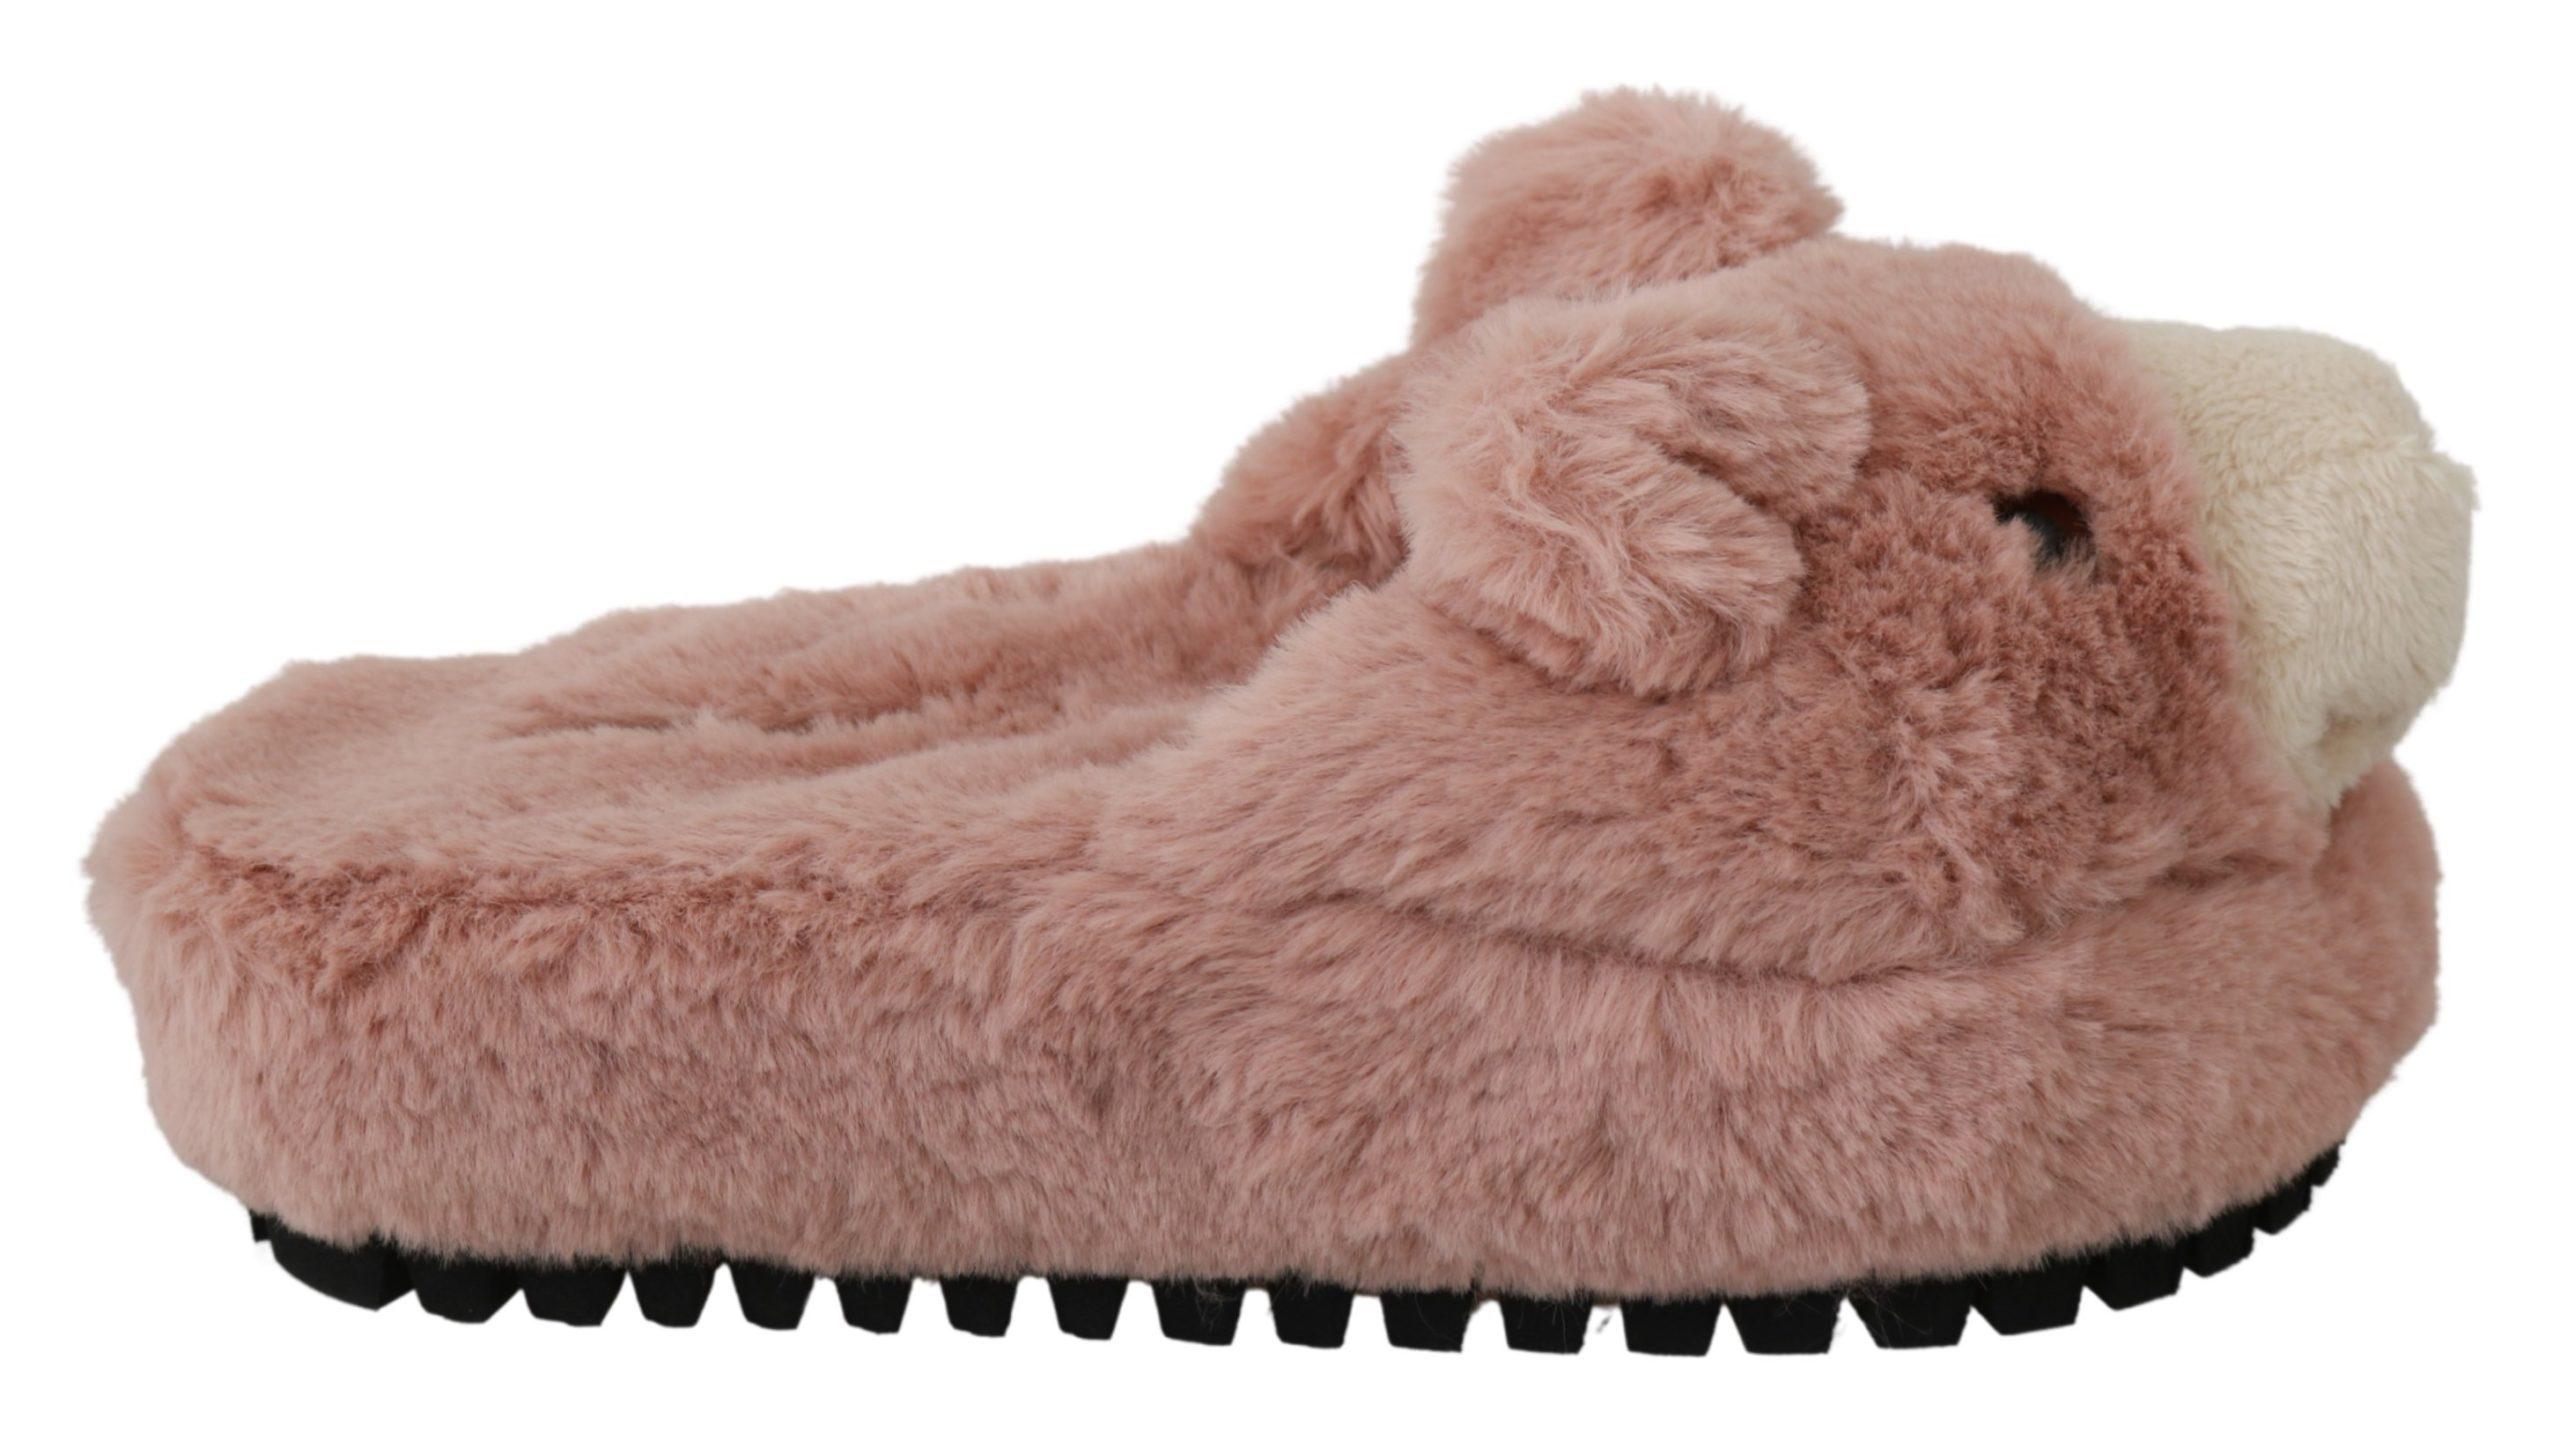 Dolce & Gabbana Women's Bear House Flat Shoe Pink LA6471 - EU35/US4.5